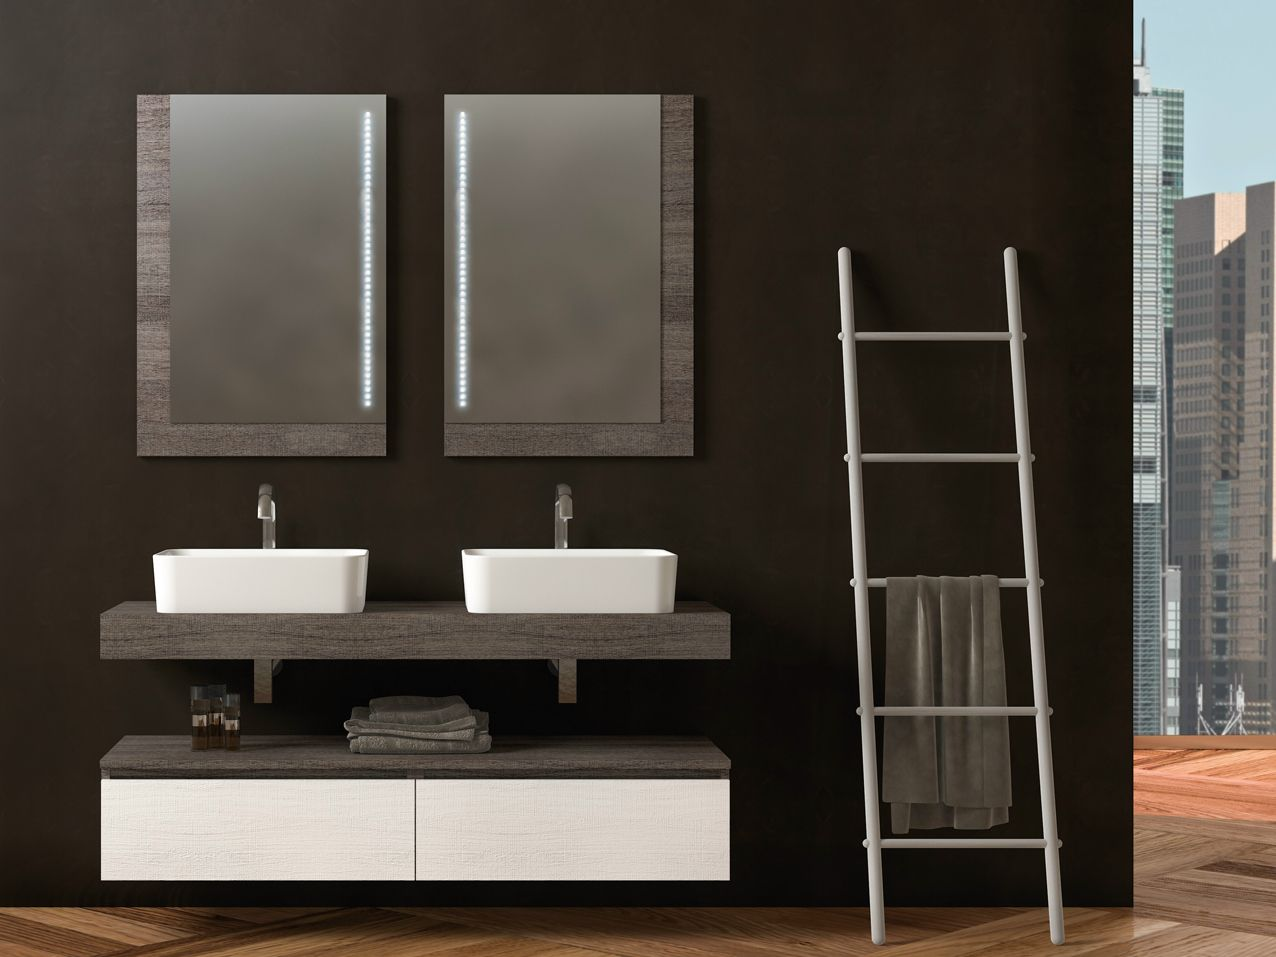 Mobili bagno moderni doppio lavabo mobile lavabo - Mobili per lavabo ...